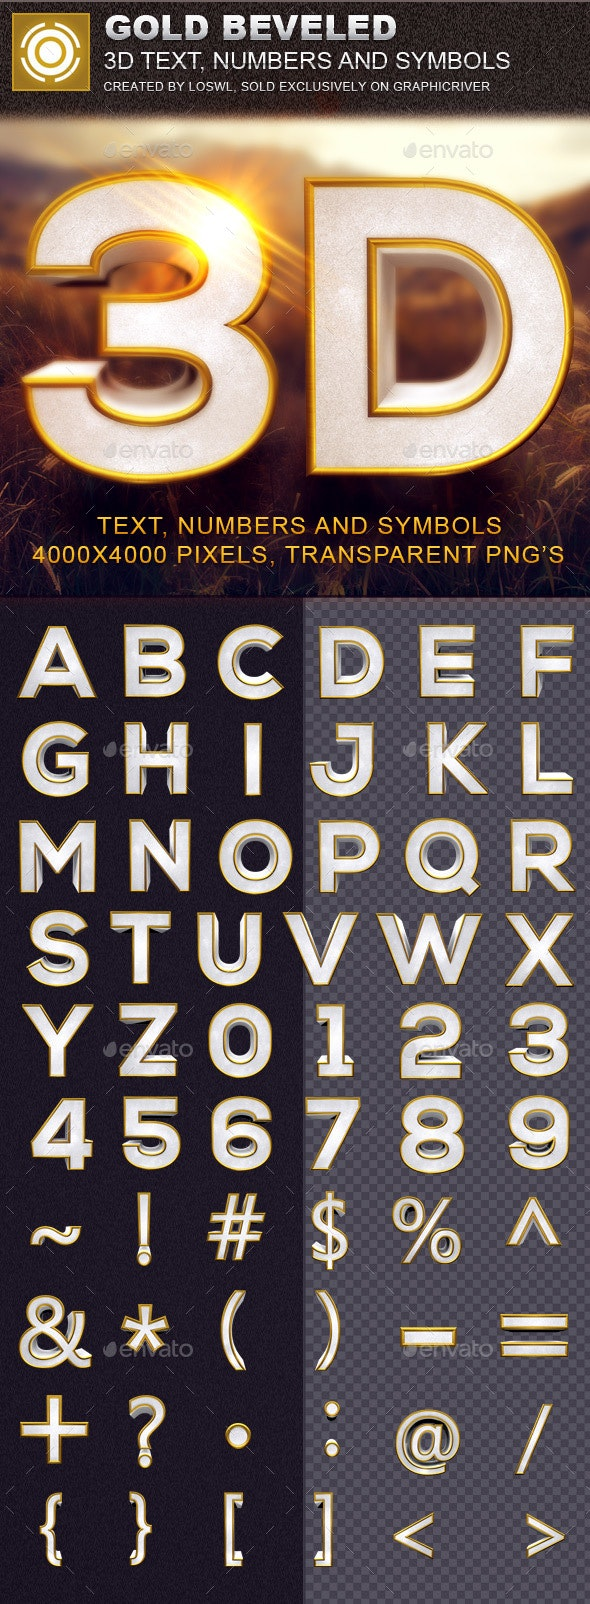 Gold Beveled 3D Text and Symbols - Text 3D Renders